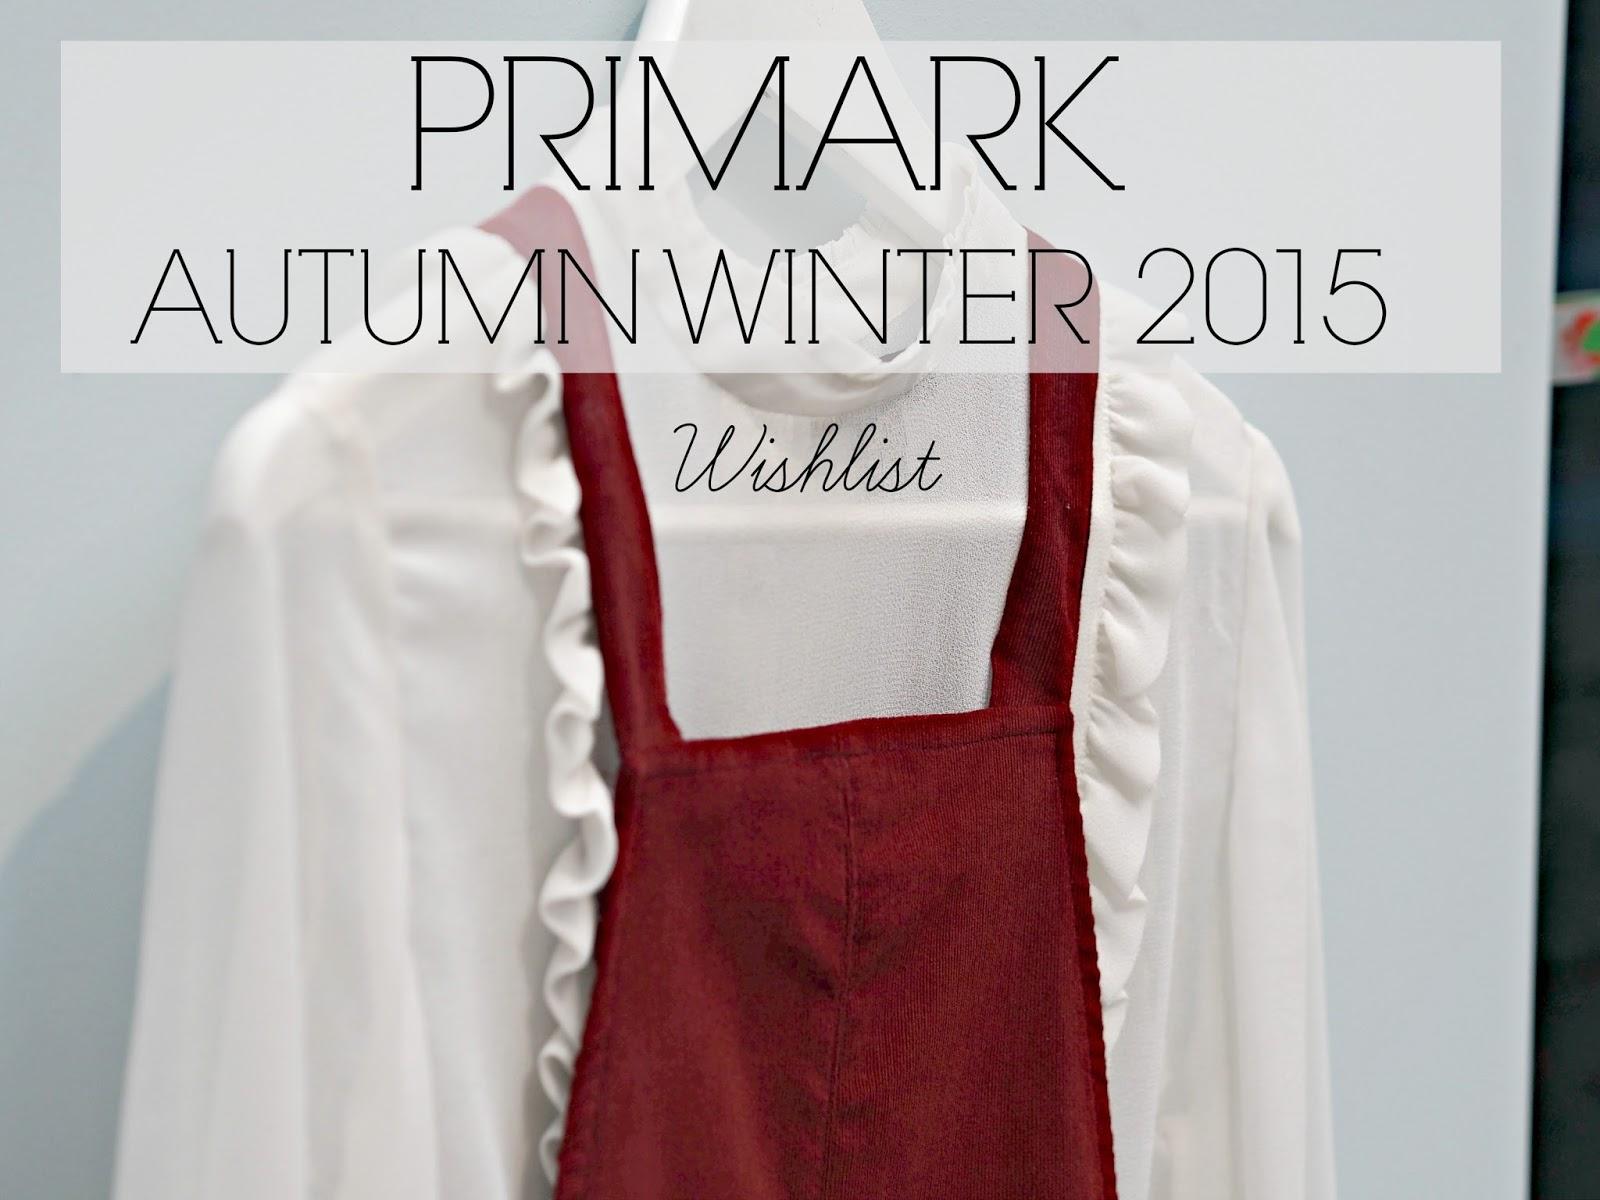 e39976914a60 Primark Autumn Winter 2015 Wishlist - Fashion Mumblr